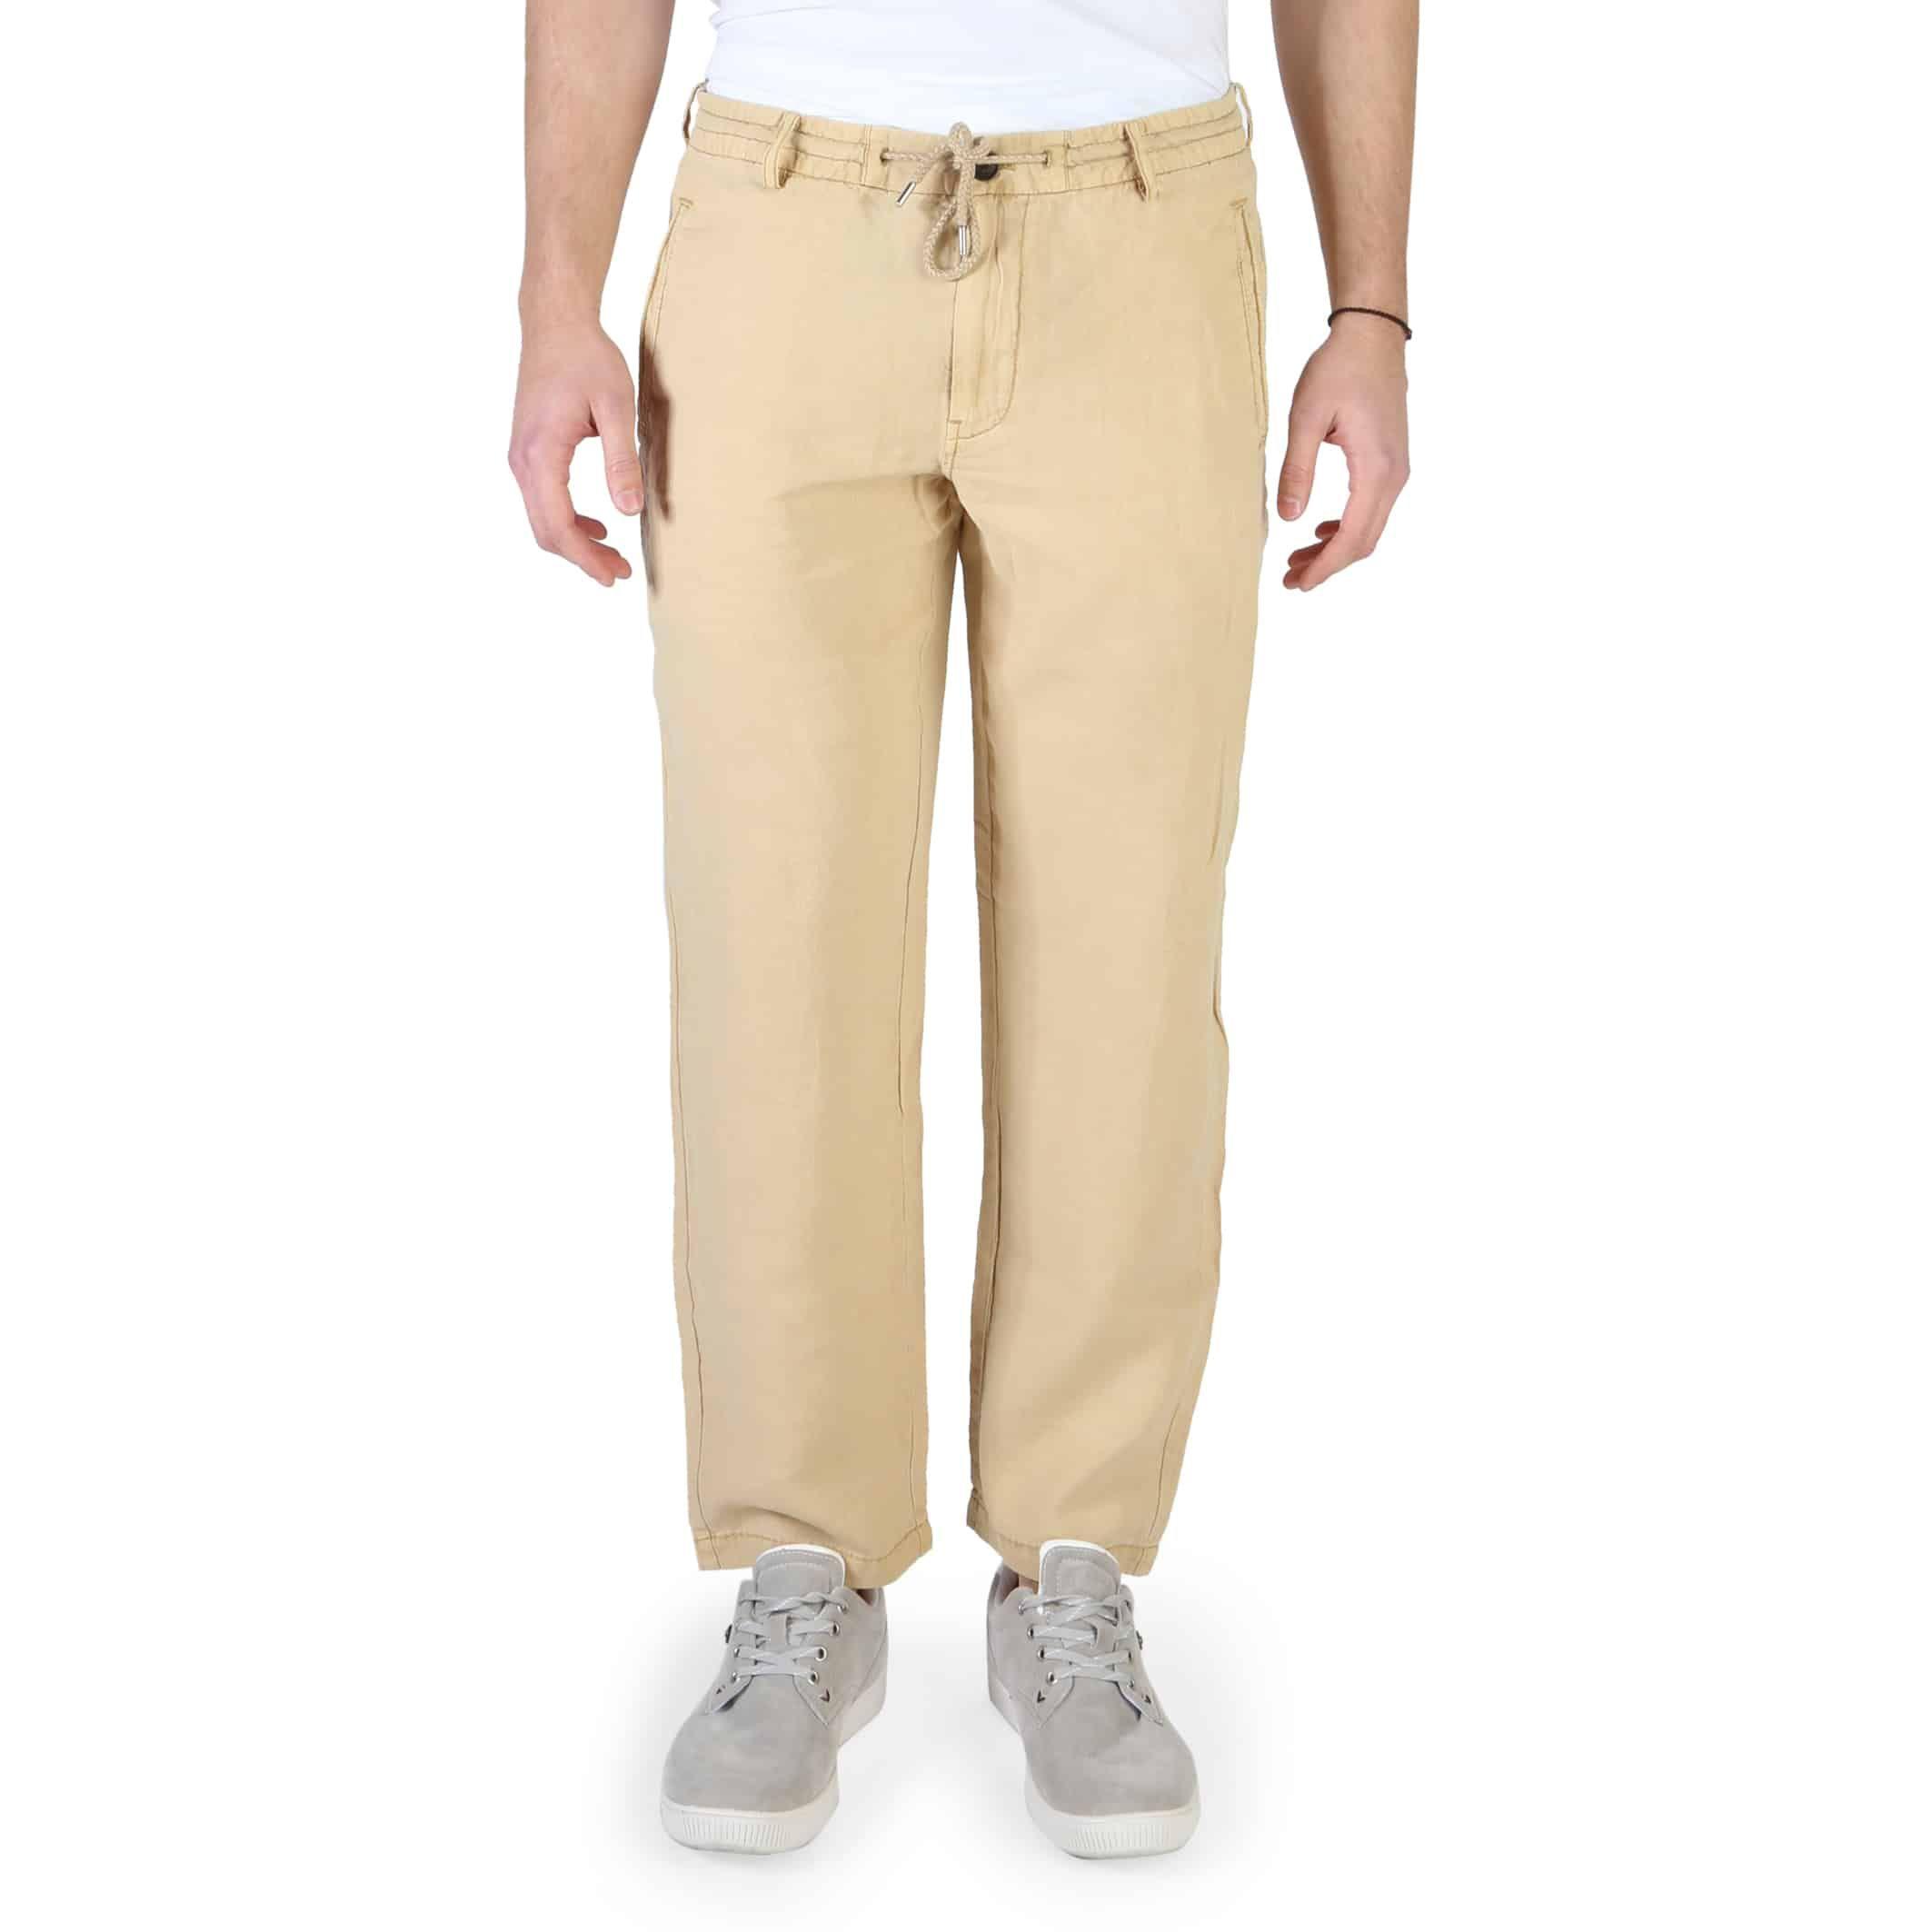 Armani Jeans – 3Y6P56_6NDMZ – Marrone